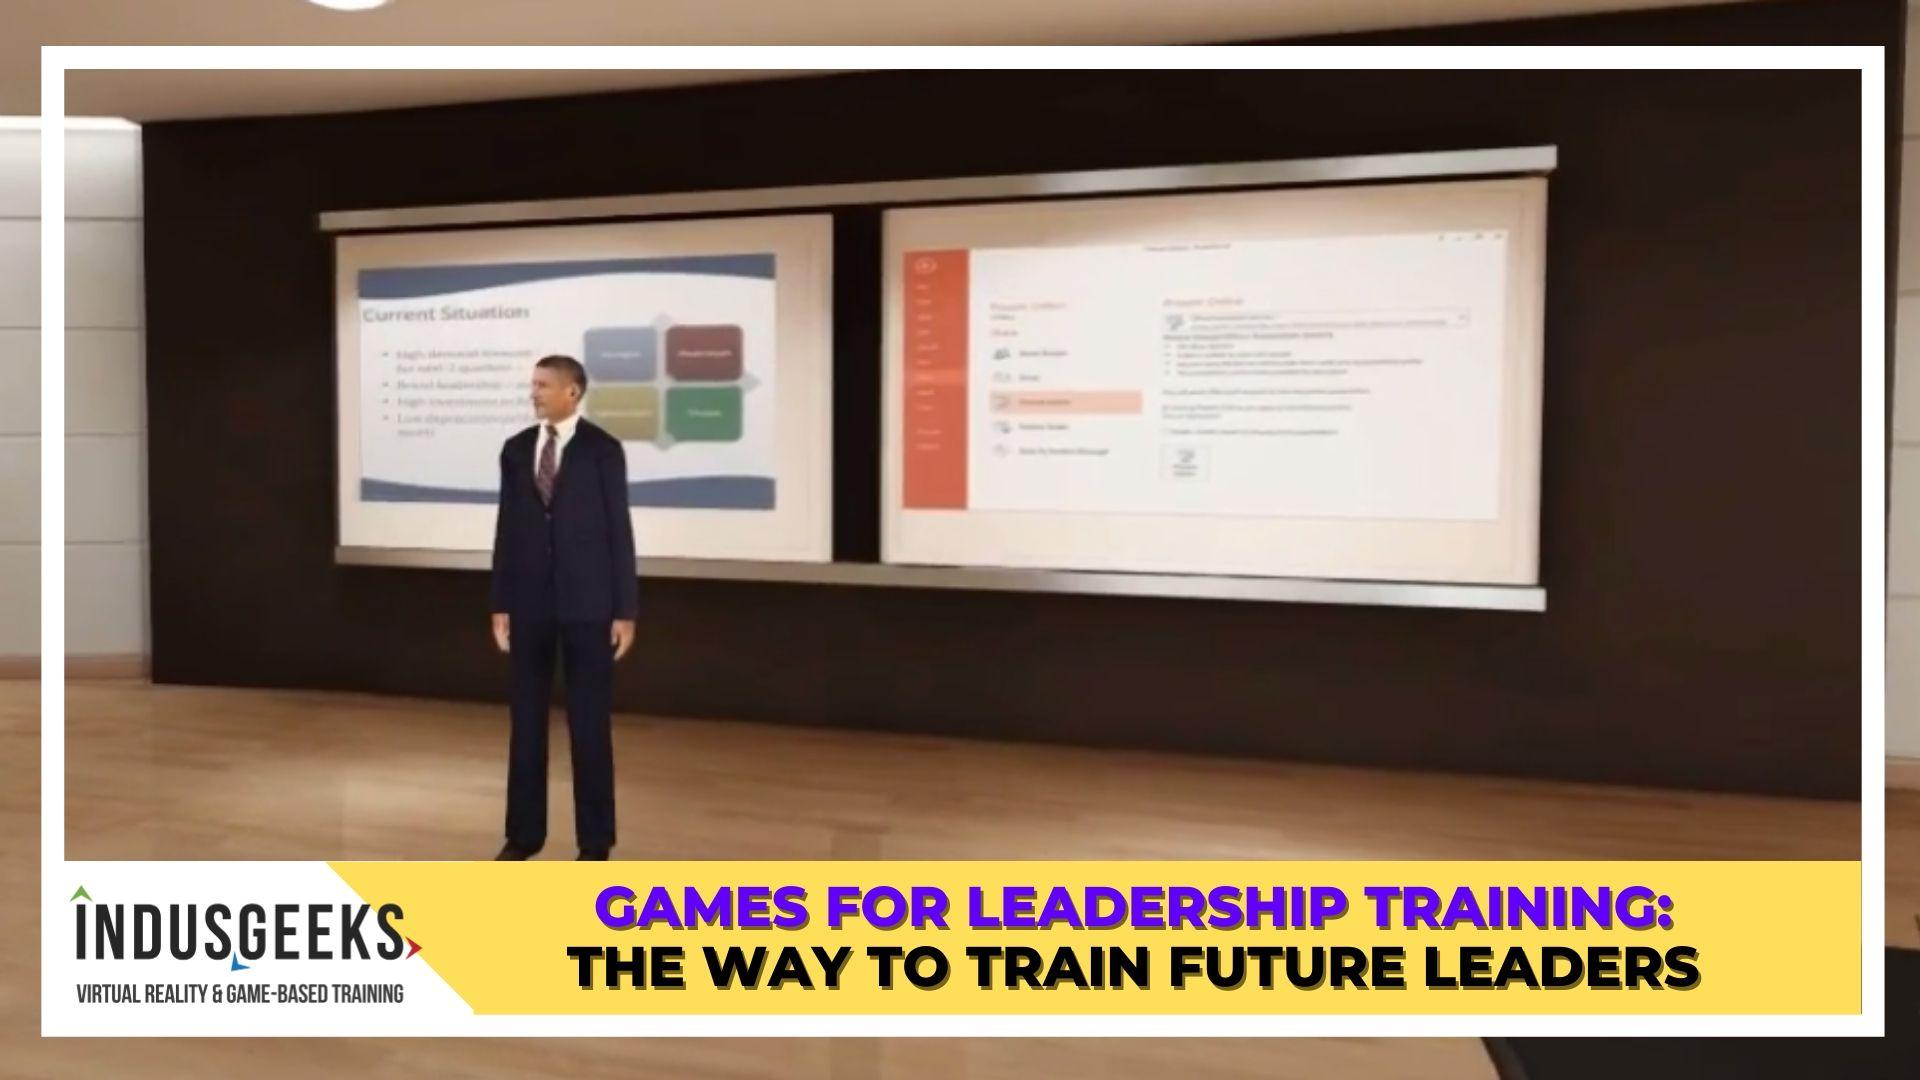 Games for Leadership training